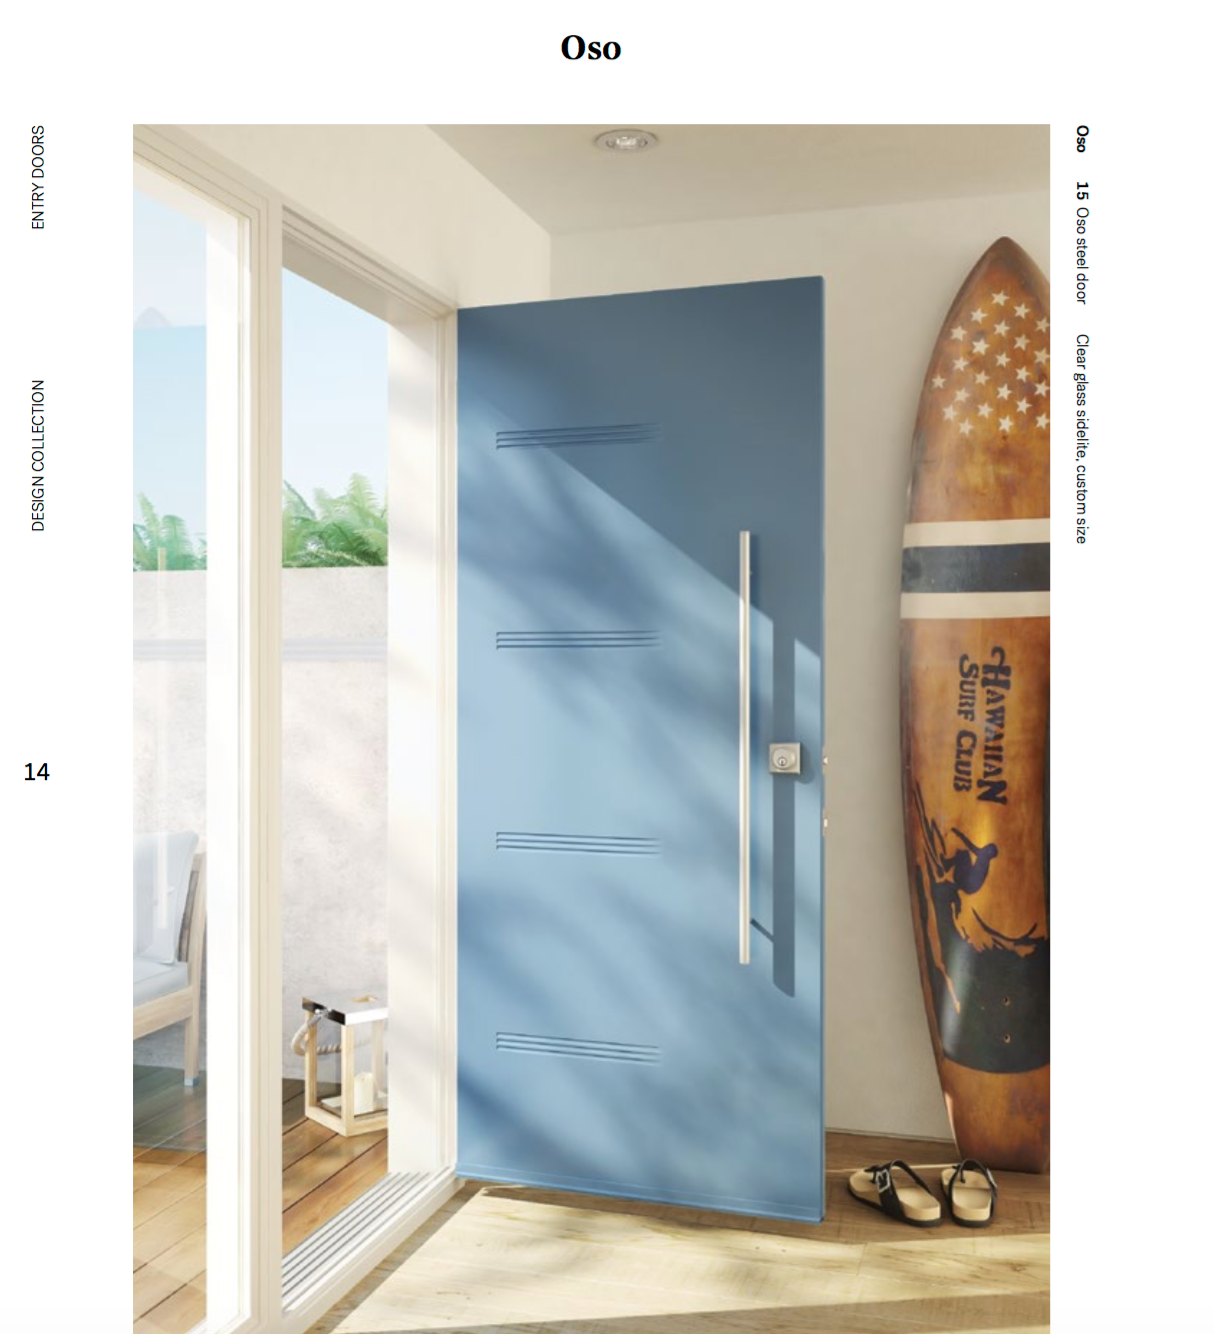 novatech from Eco choice windows and doors  sc 1 st  Pinterest & novatech from Eco choice windows and doors | house ideas | Pinterest ...